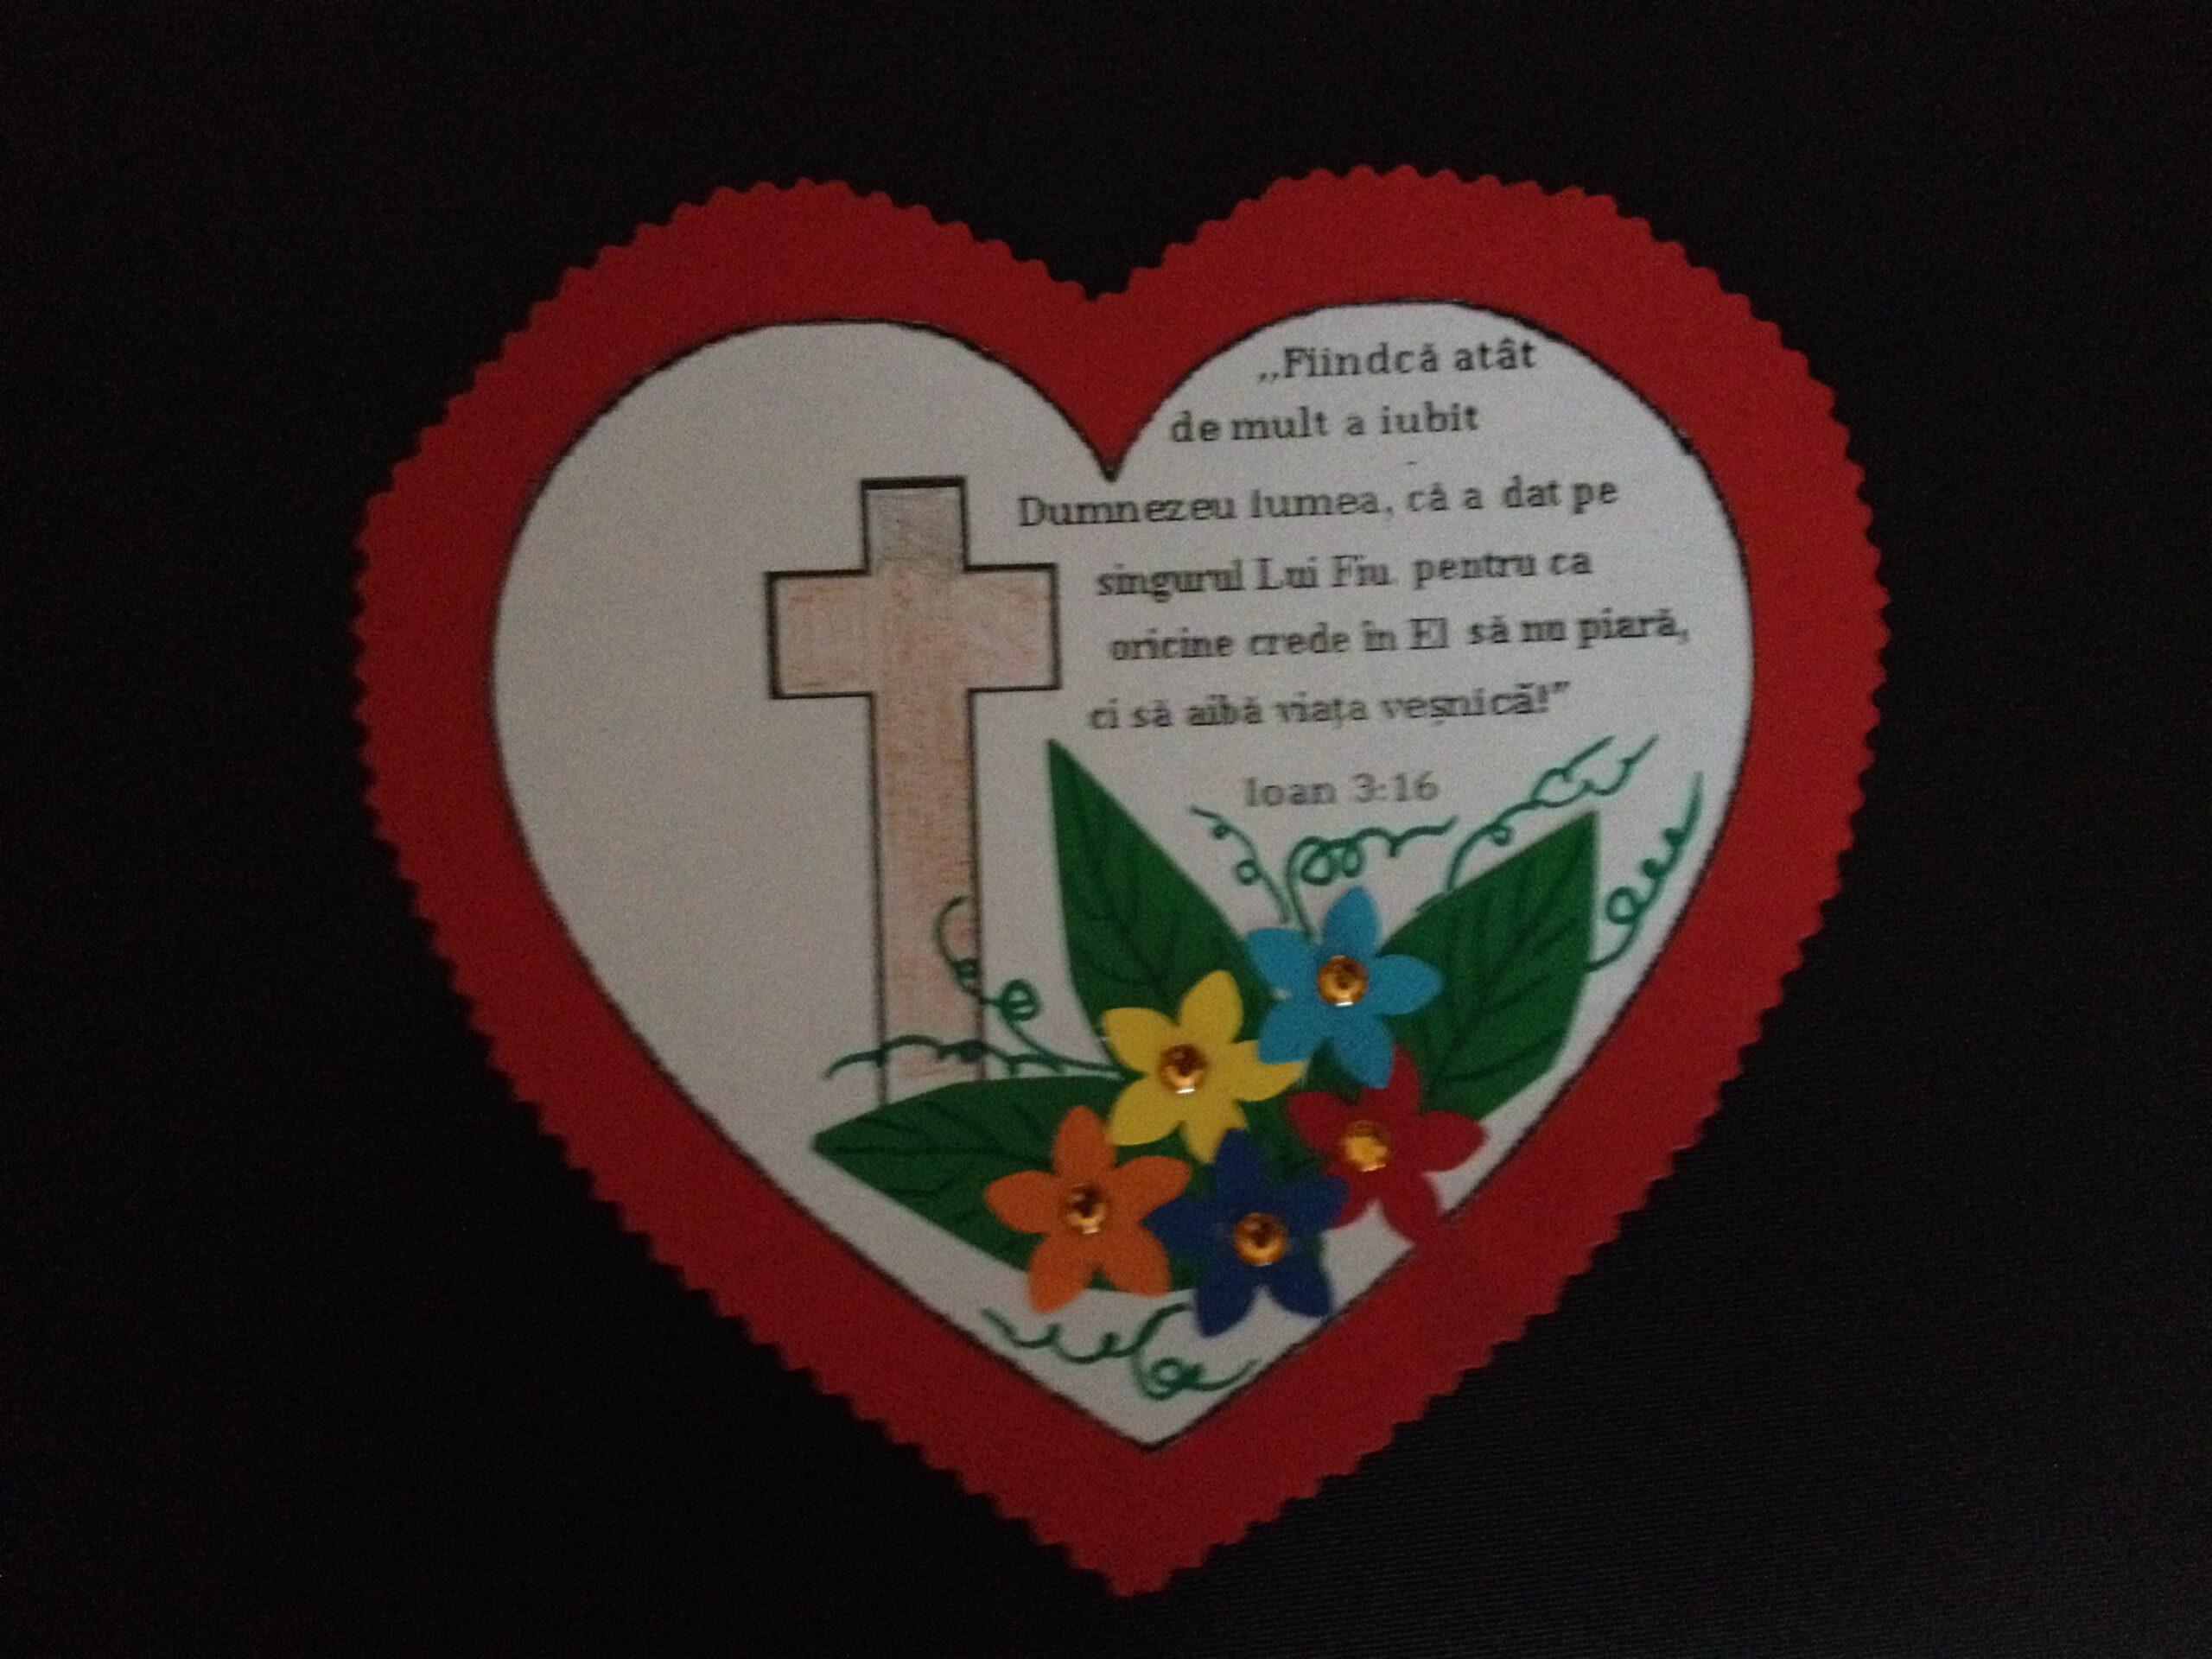 Ioan 3.16 inima